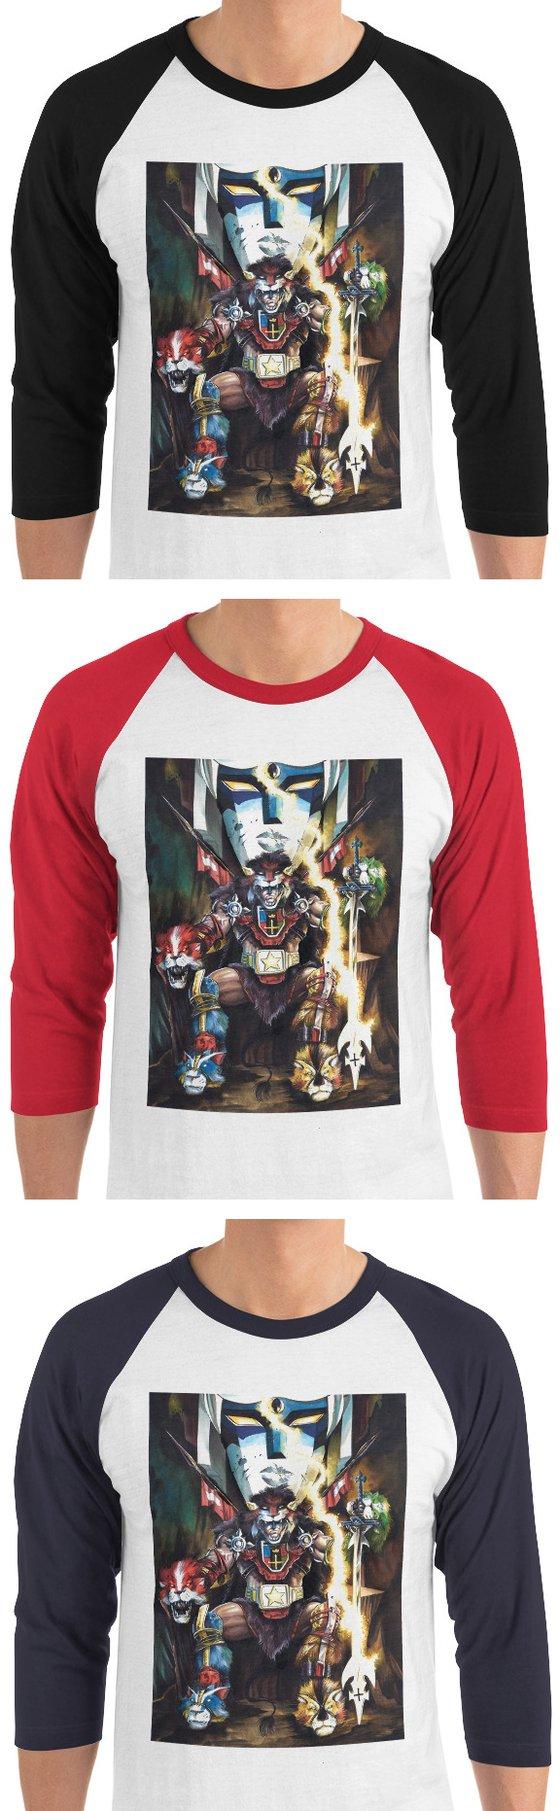 Image of VÖL-TRAHN the Barbarian 3/4 sleeve t-shirt